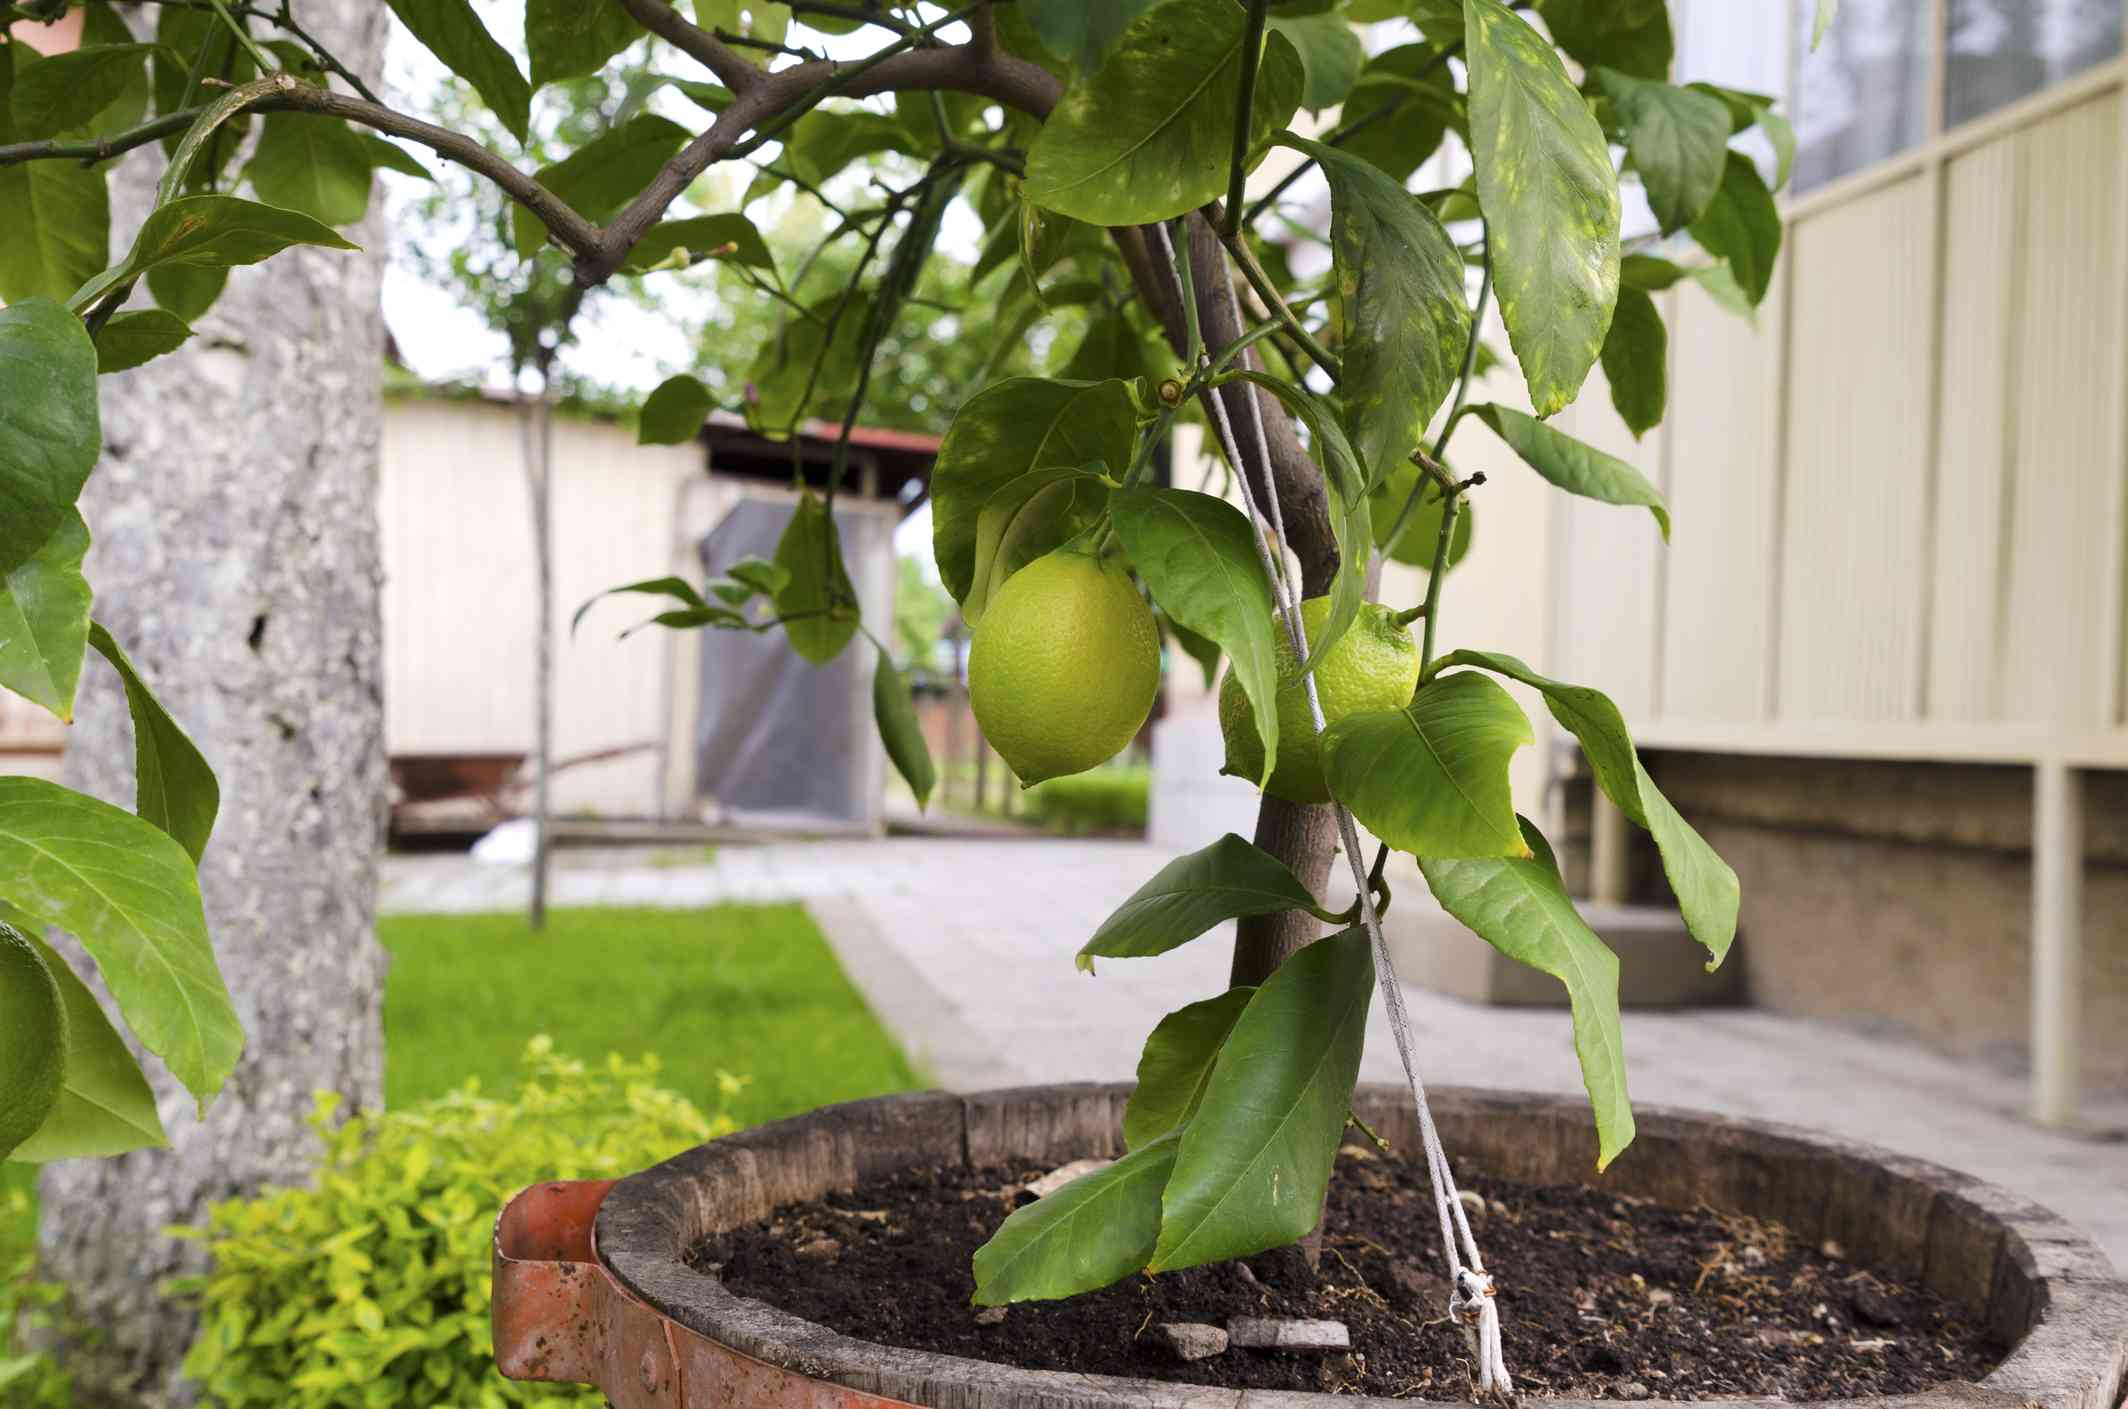 Closeup of a lemon tree in a pot in an outdoor garden.